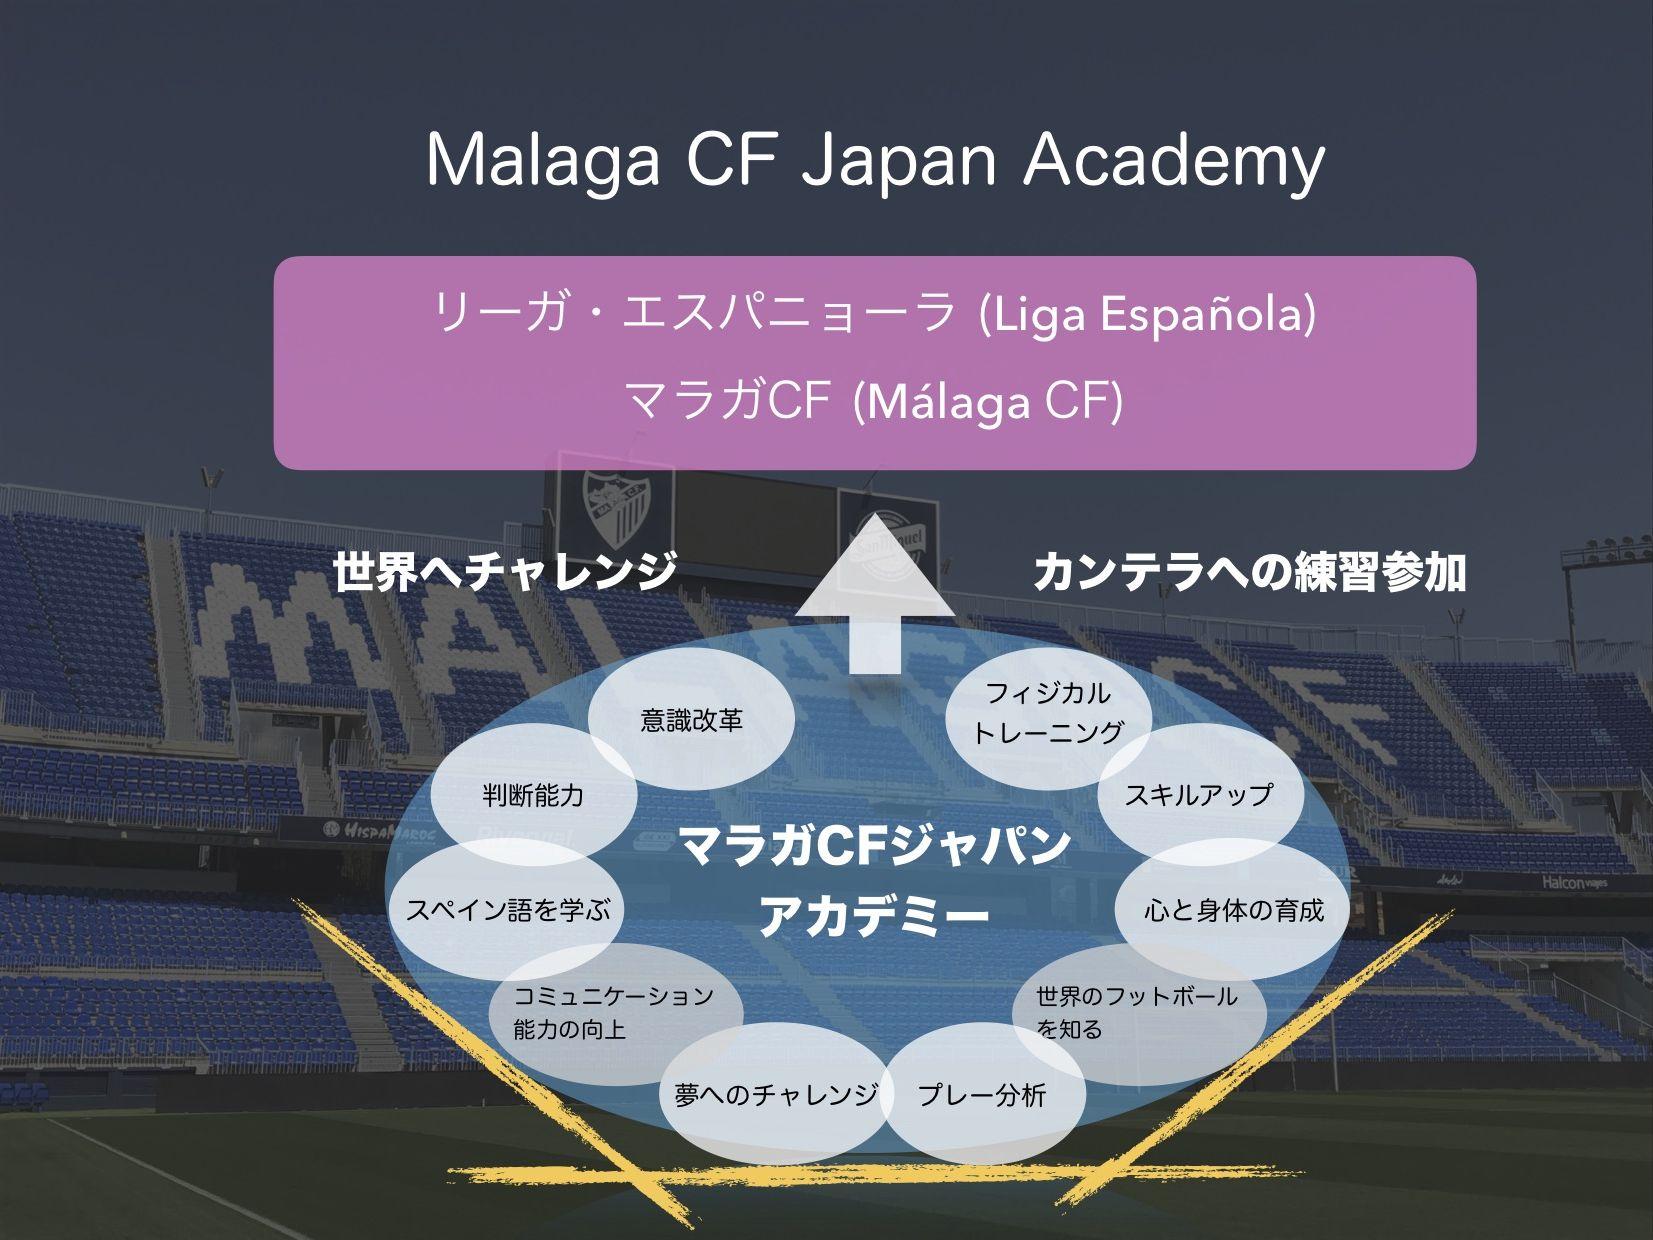 Malaga CF Japan Academy